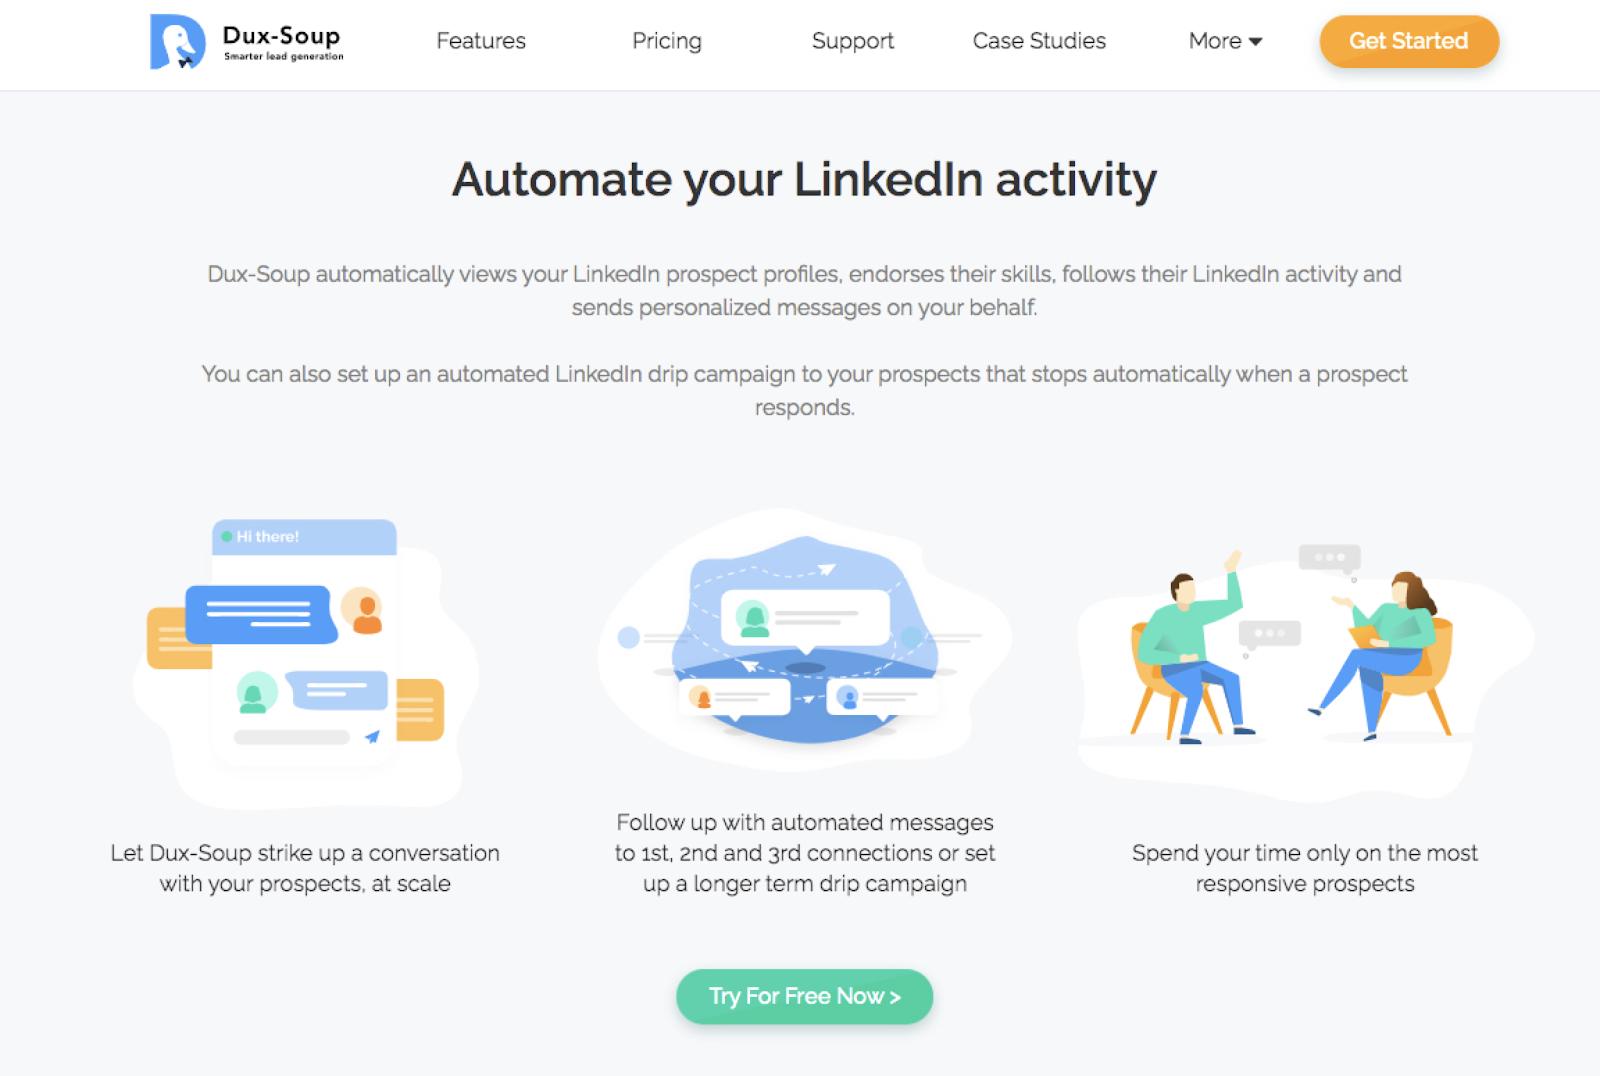 Dux-Soup vs. Octopus Review for LinkedIn Automation